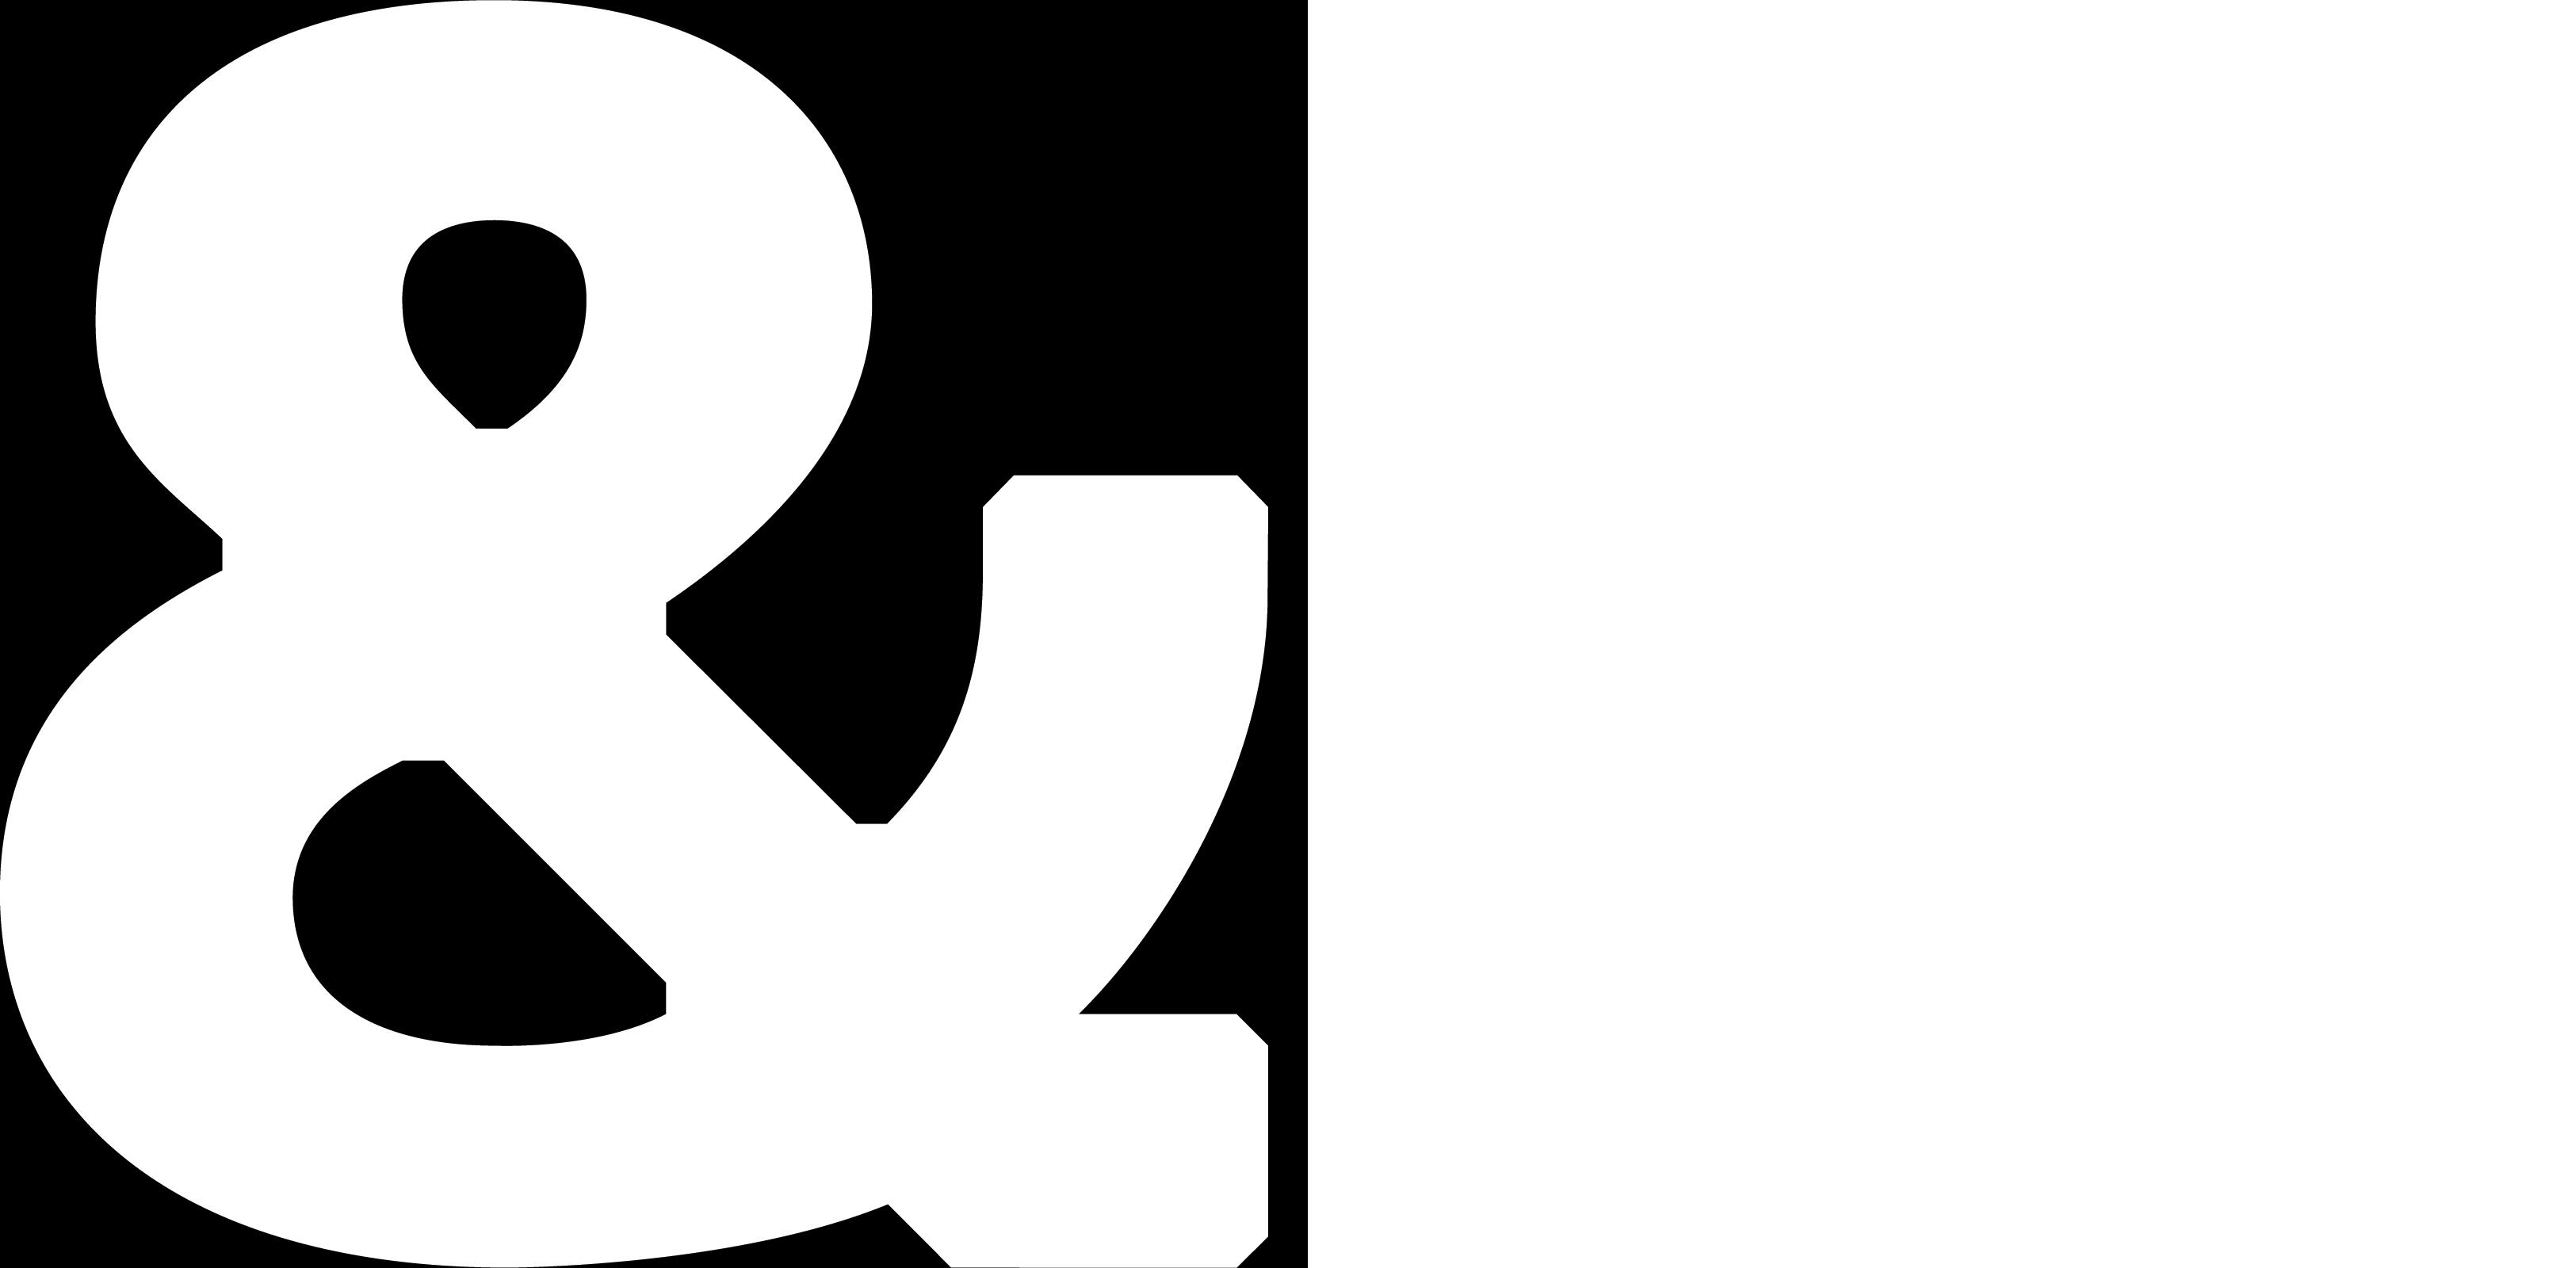 Matthijs Matt van Leeuwen Mother Design Andbox Maxwell Osborne Identity Ampersand